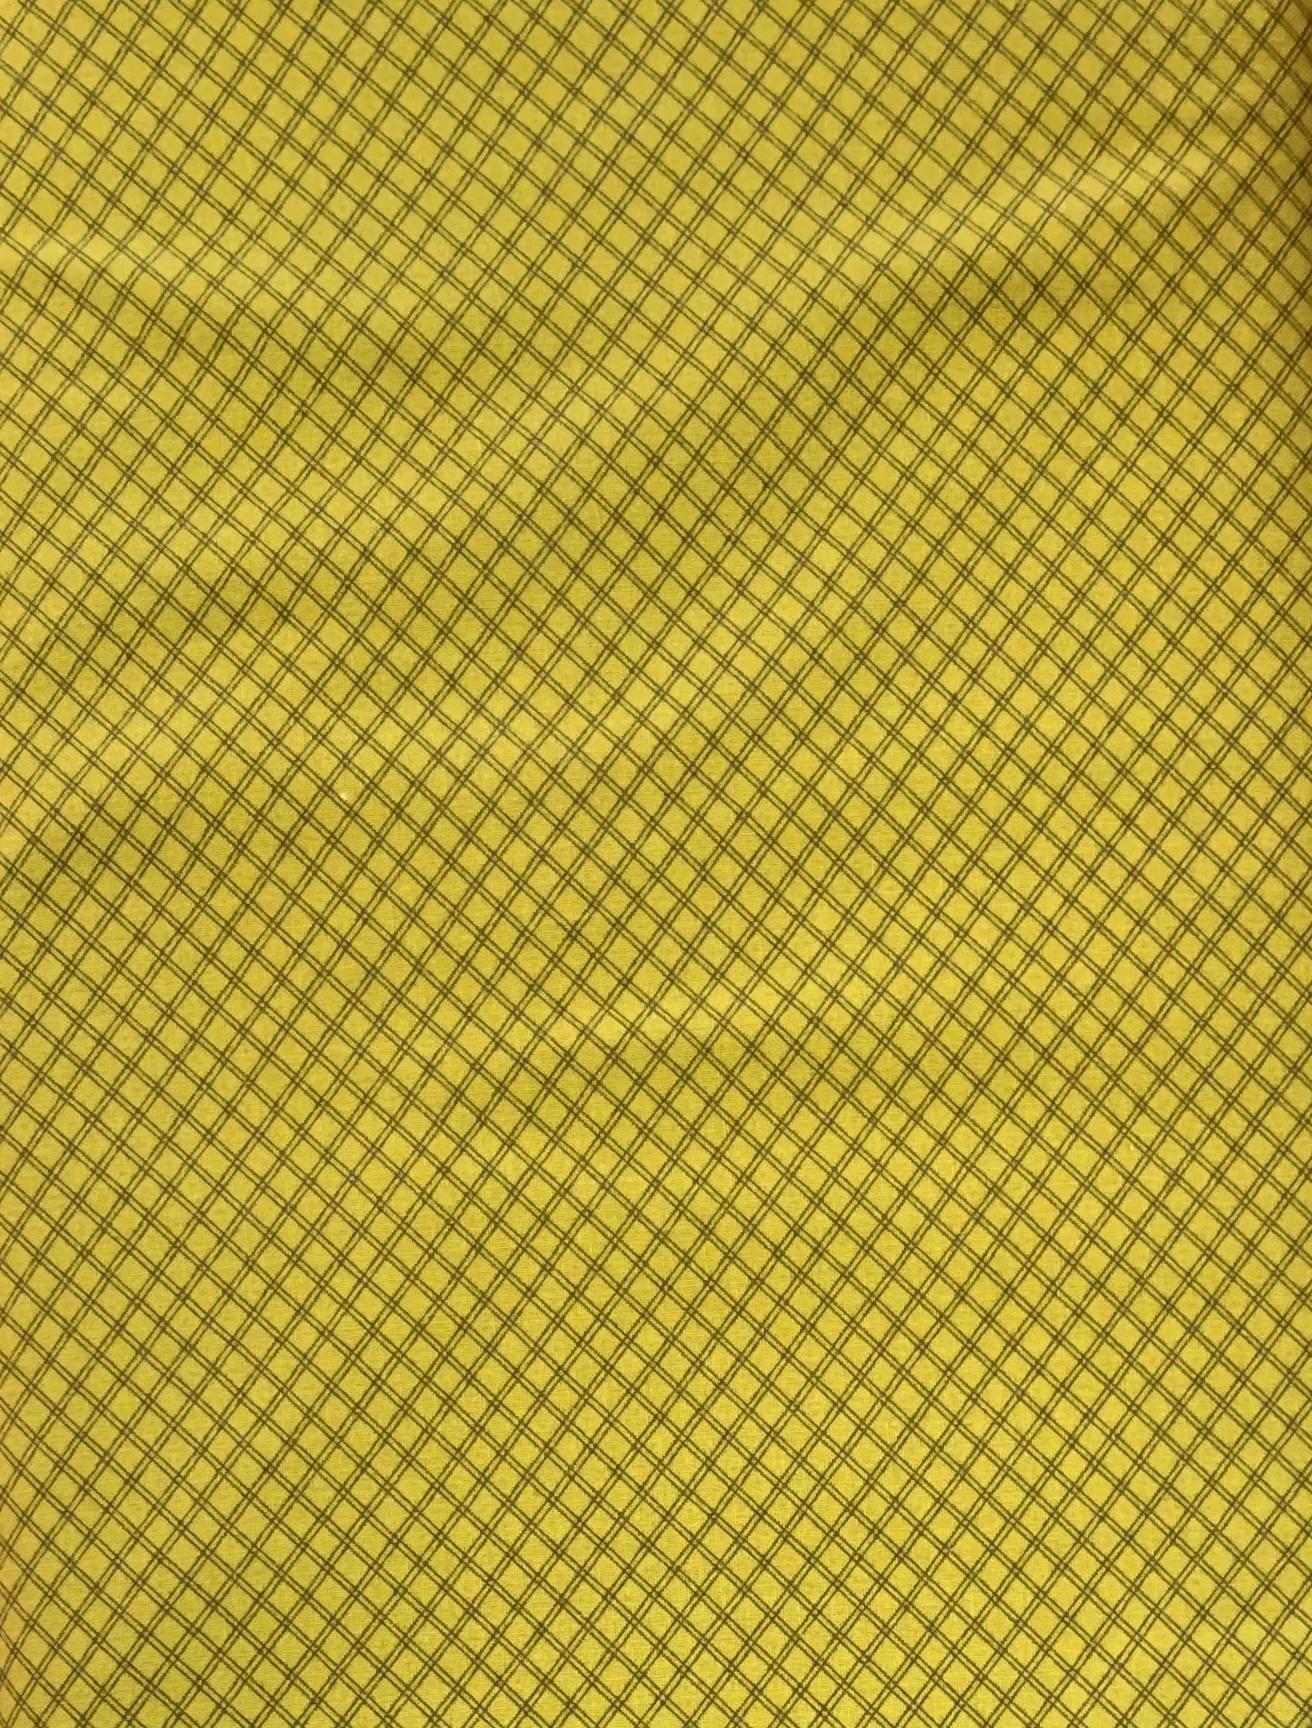 MODA Silver Lining Green per cm or $19/m